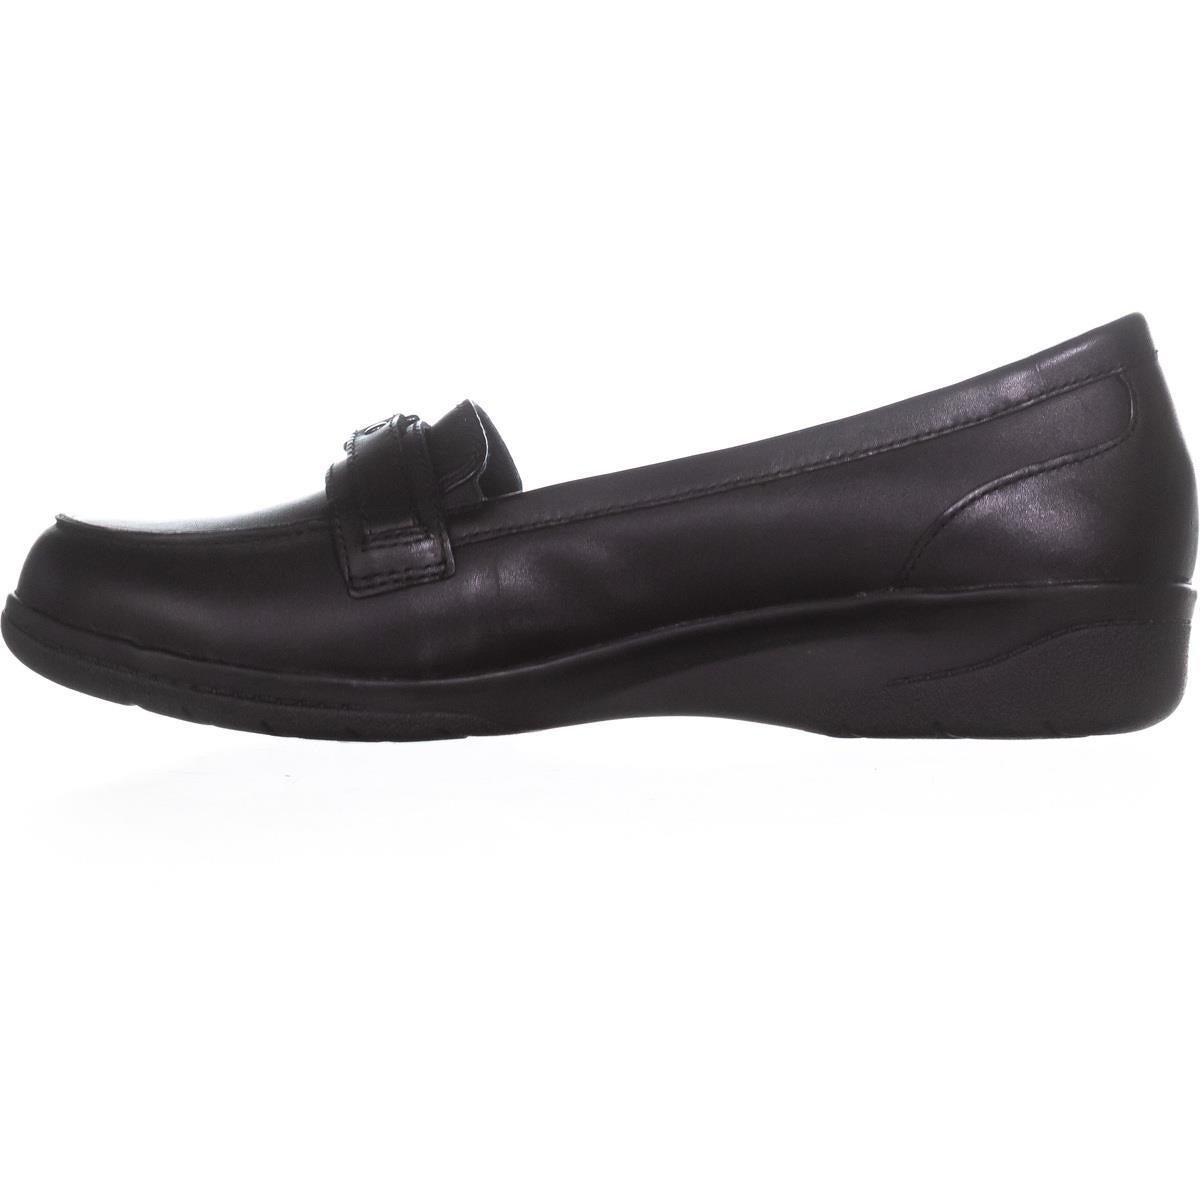 d9011c663a1 Shop Clarks Cheyn Marie Buckle Slip-on Loafers